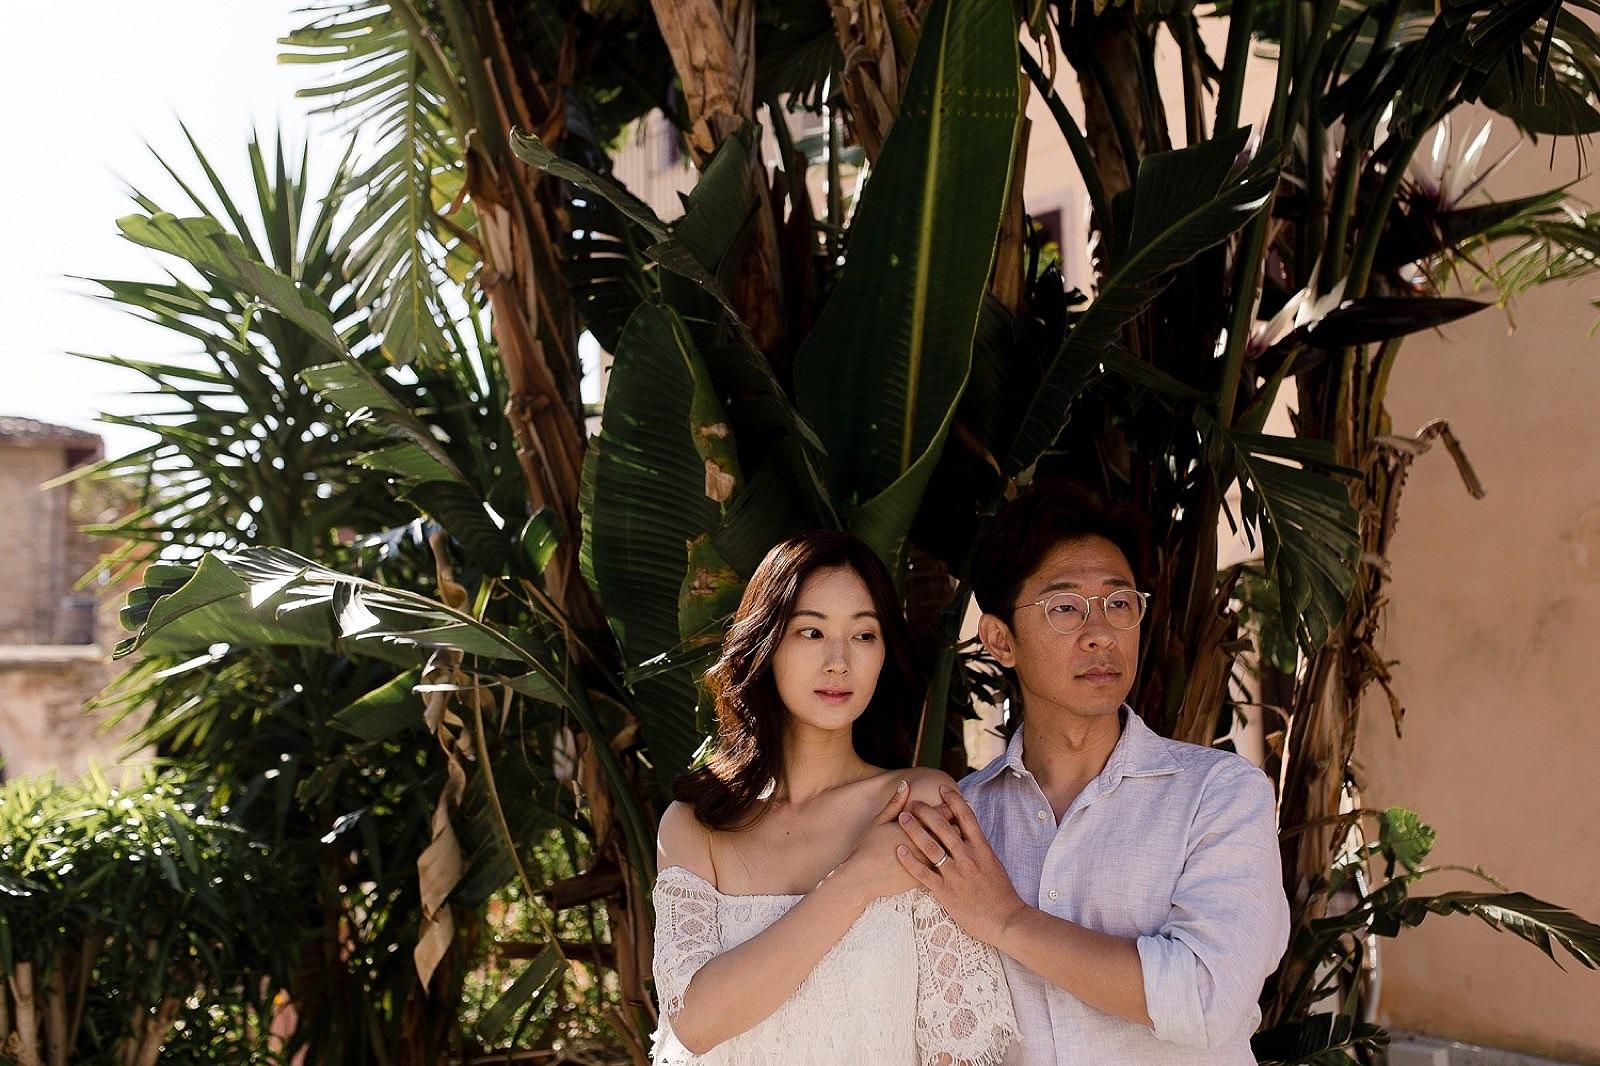 Fotomagoria Sicily Honeymoon of Korean couple 3.jpg